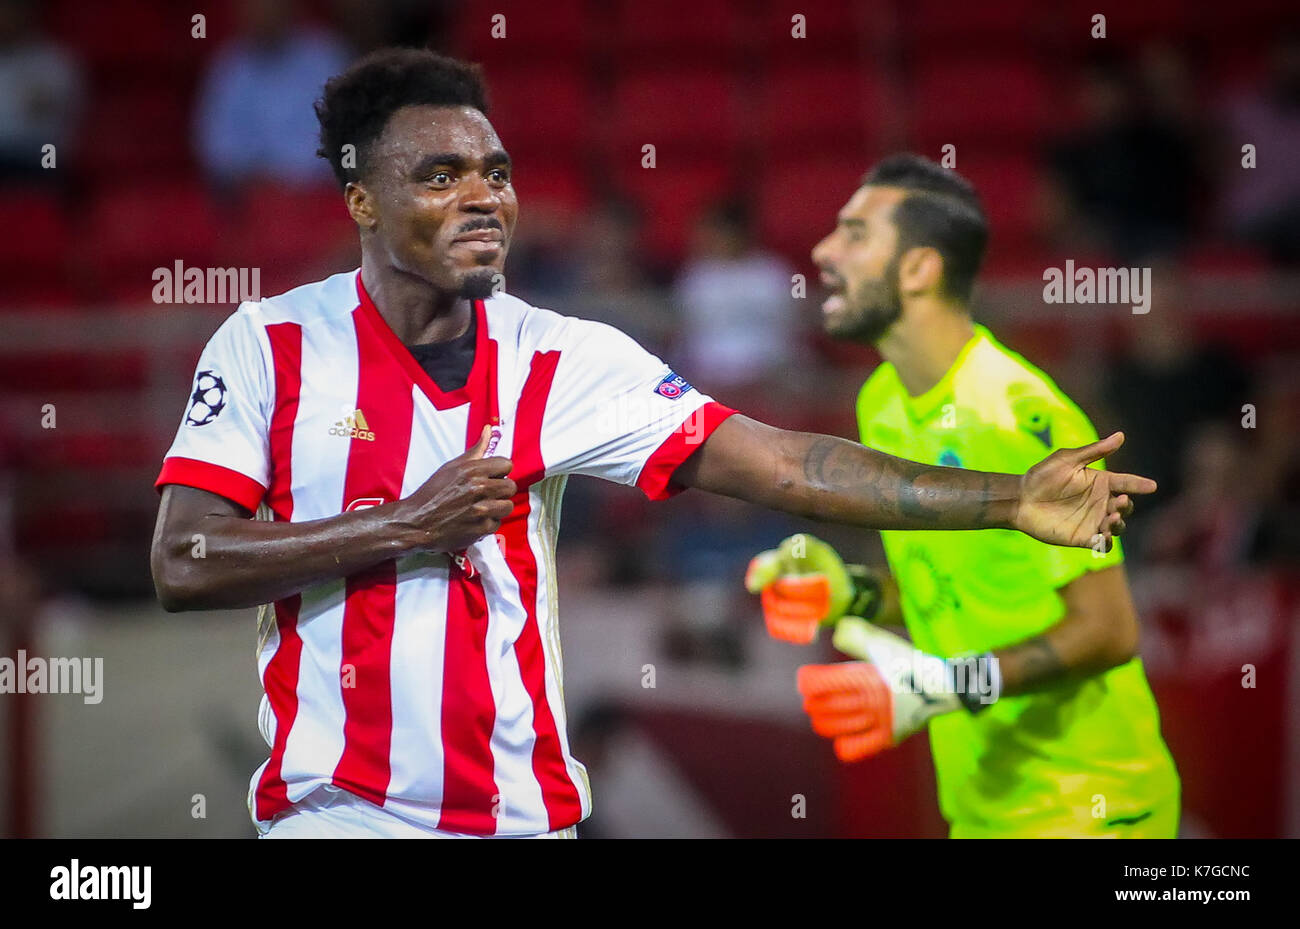 Piraeus Greece Sempteber 12 2017 Player of Olympiacos